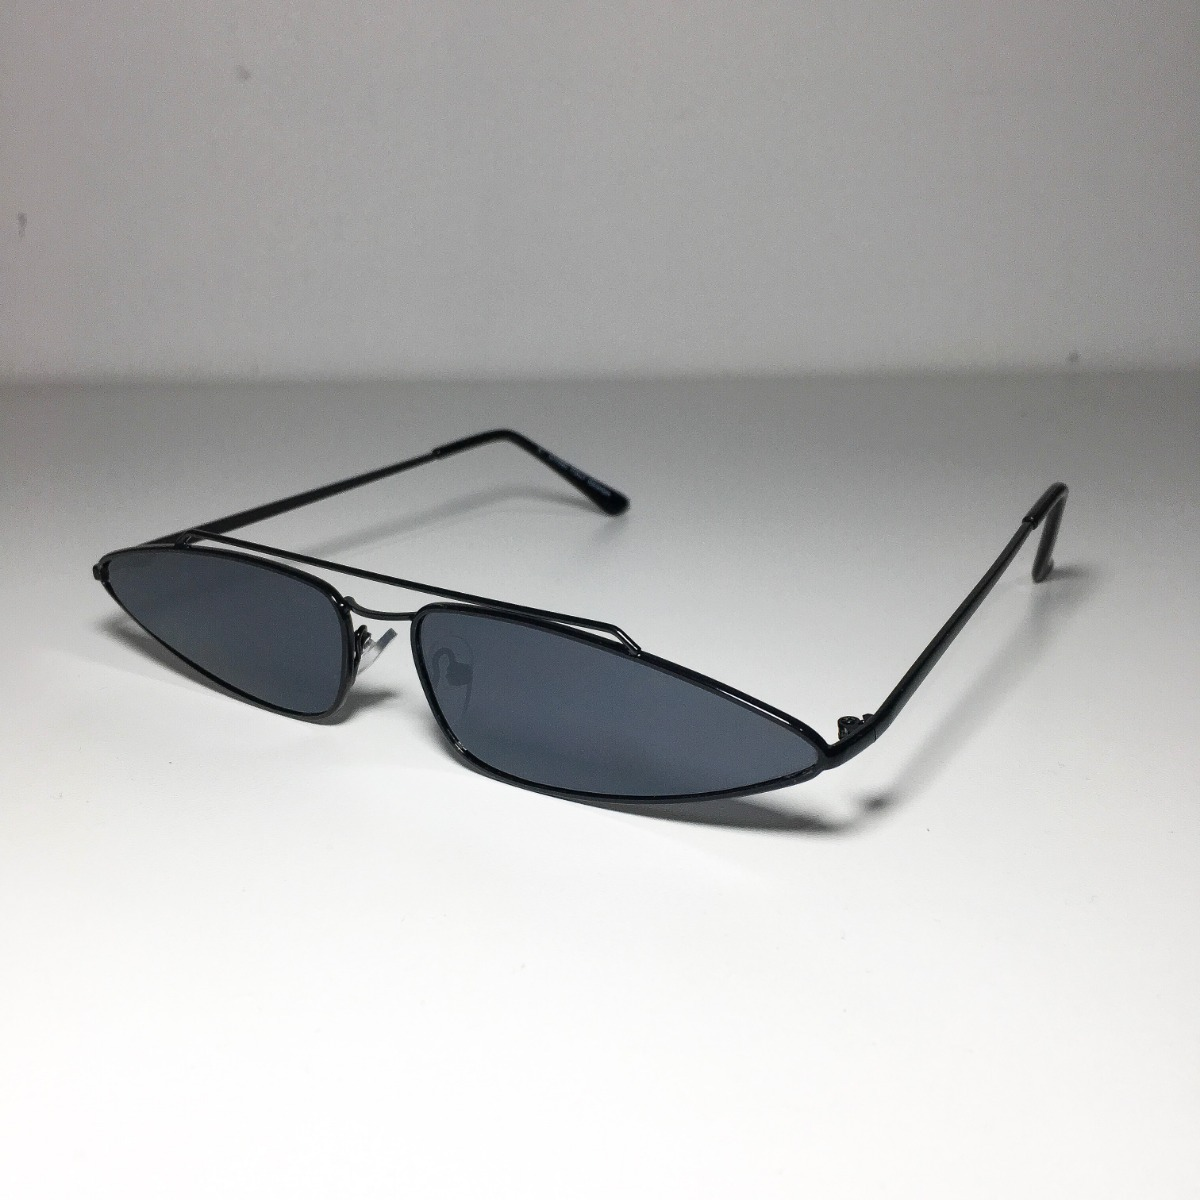 0adc35c6ac6b2 óculos retro quadrado de sol vintage anos 90 preto. Carregando zoom.